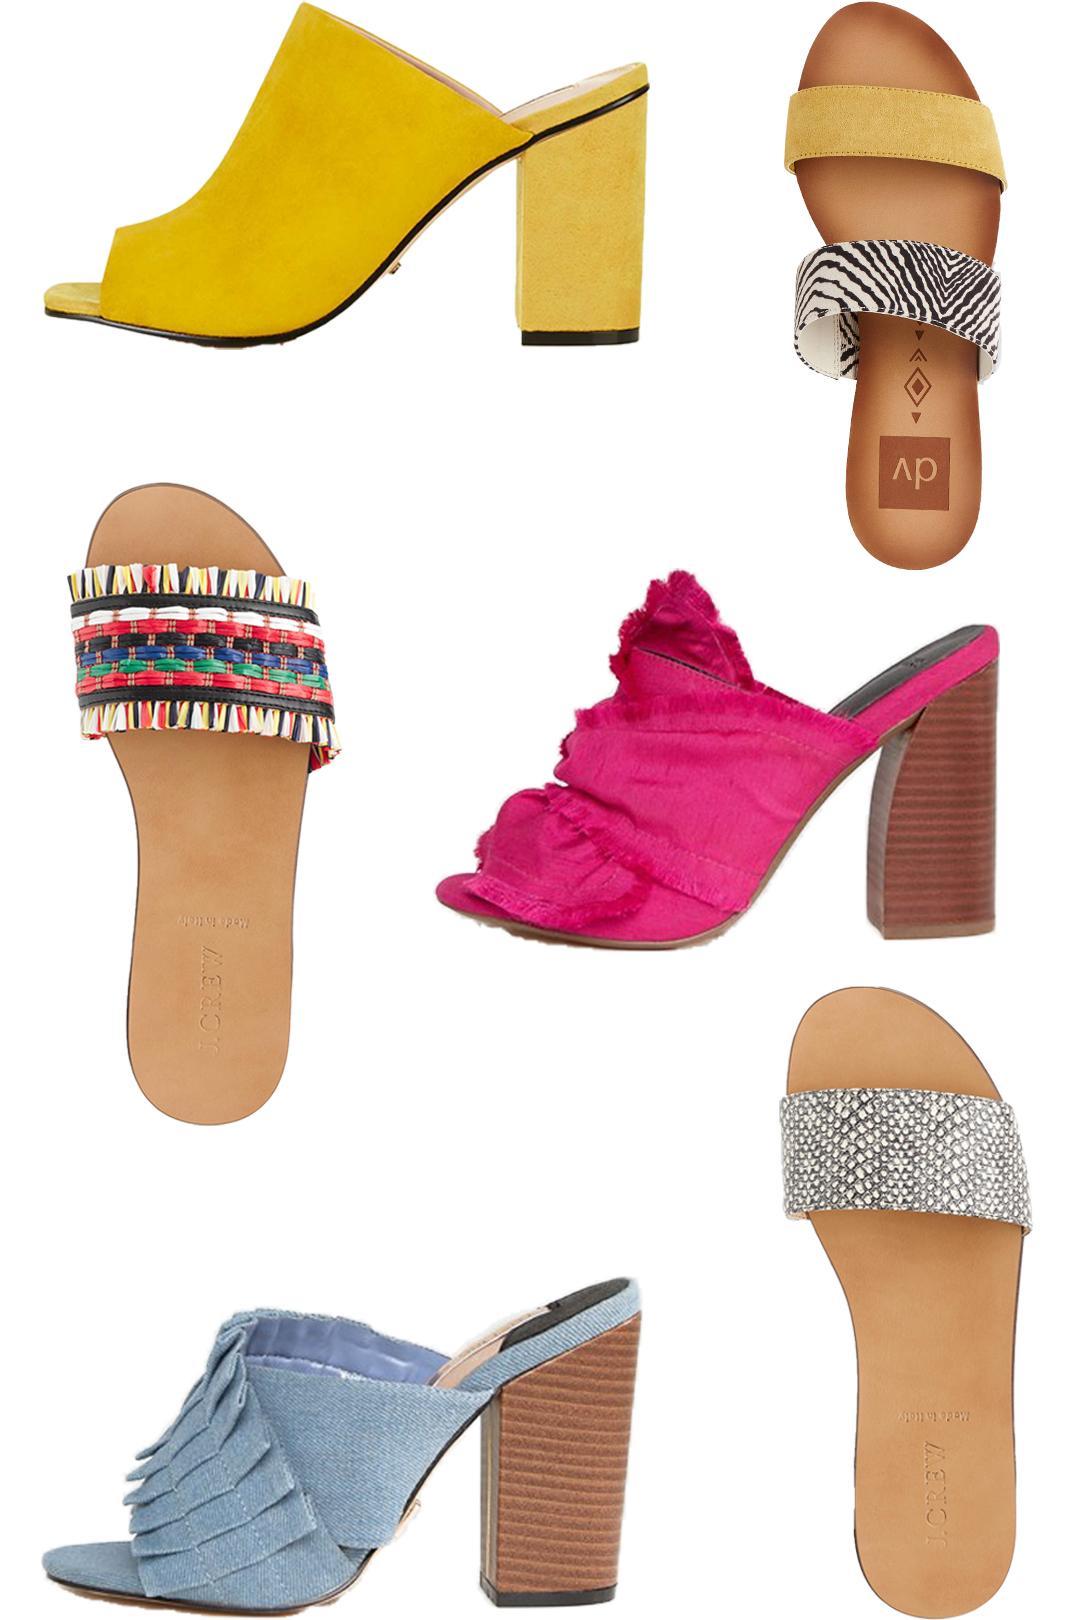 Mules Slides Shoe Trend 2017